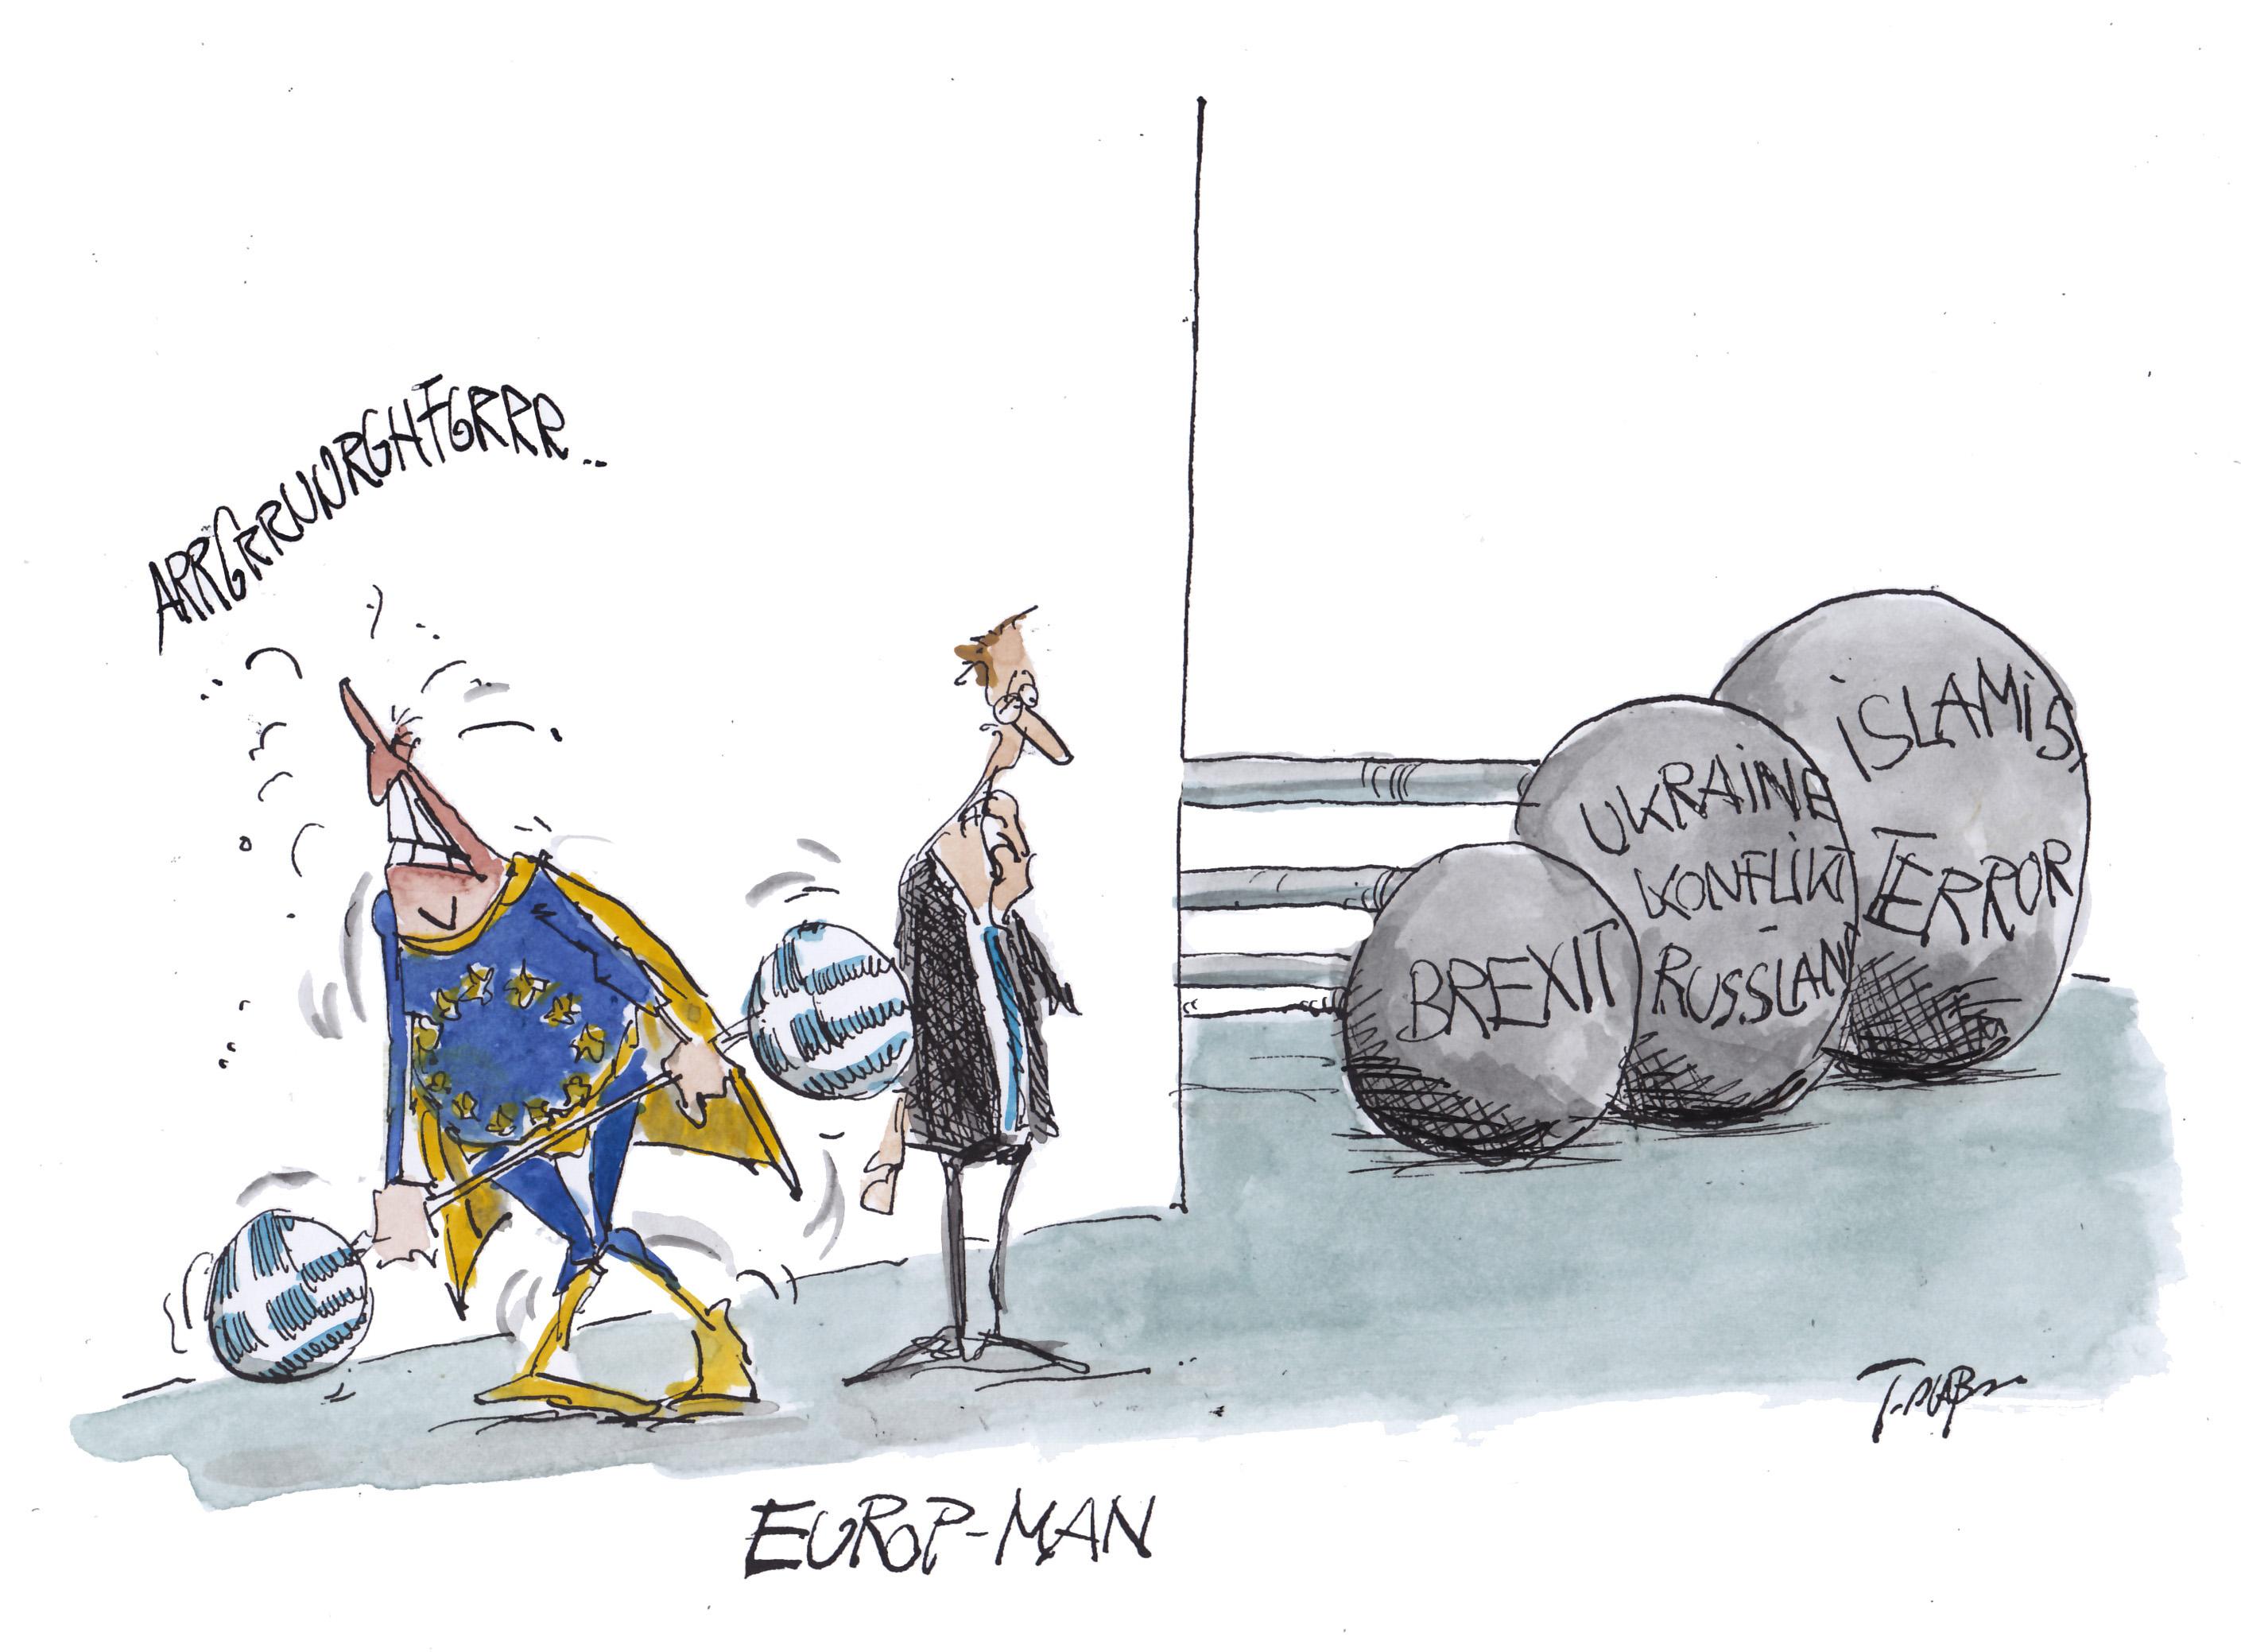 europman